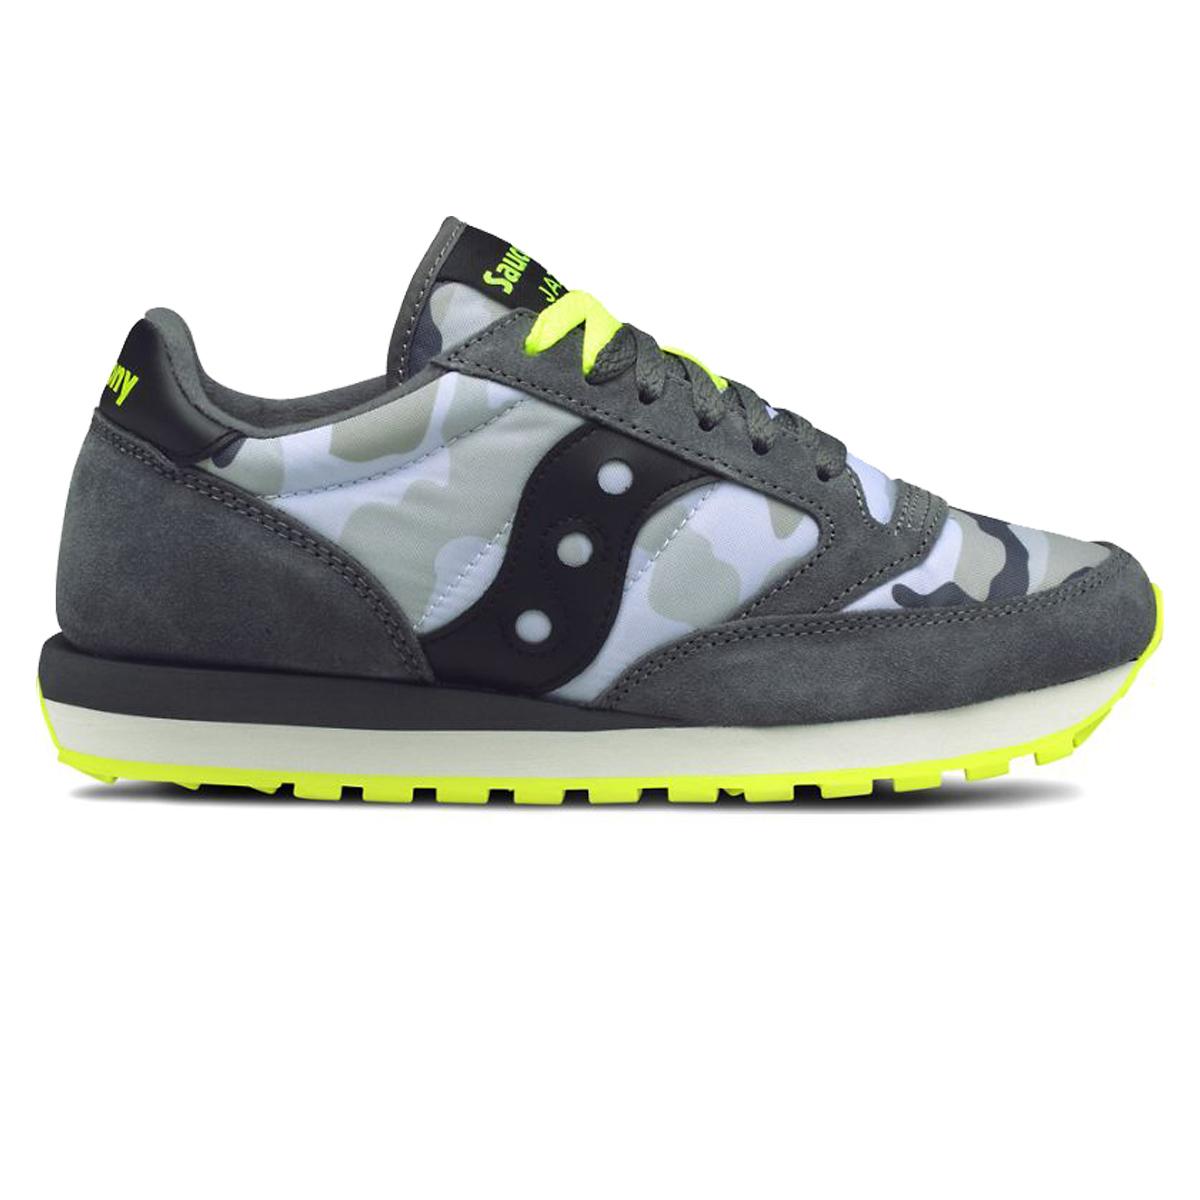 08e5b70a Saucony Jazz sneakers original man grey camo-yellow